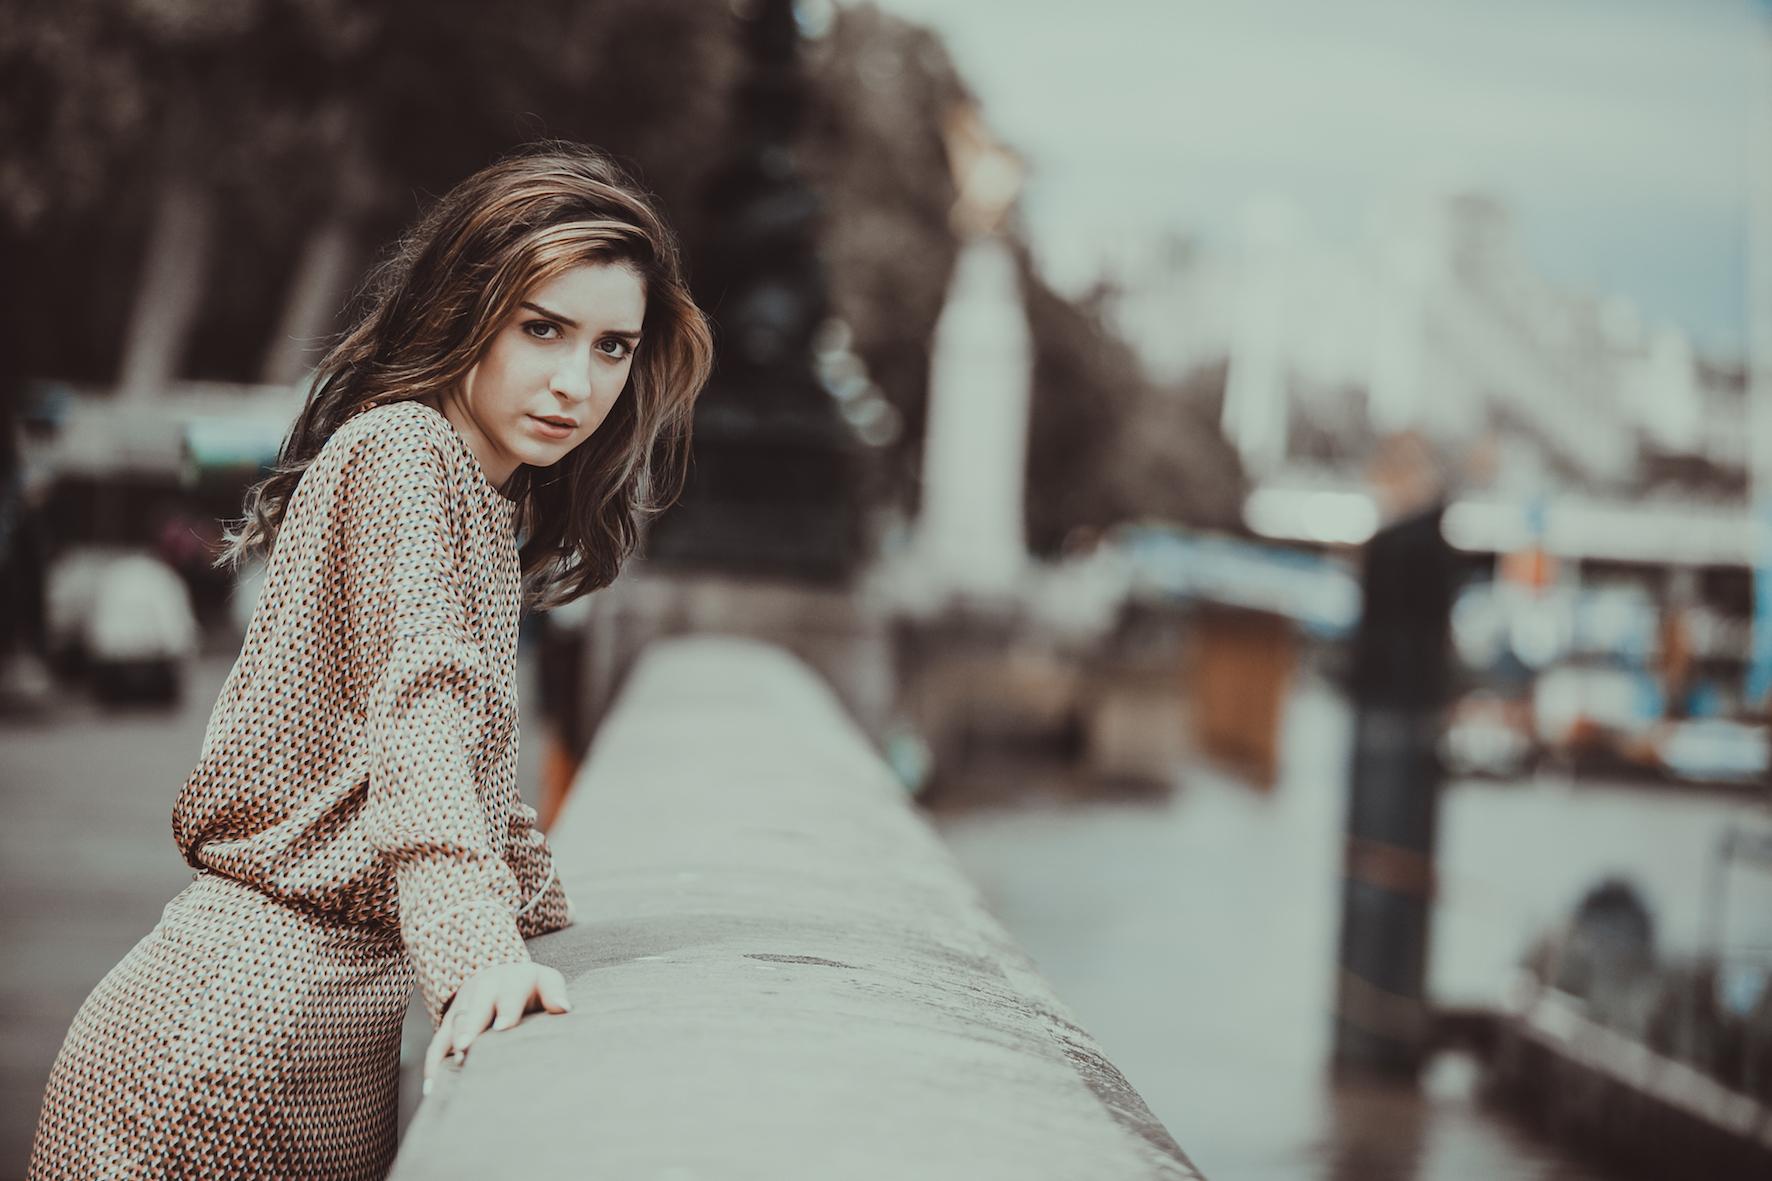 1088-160A8501-Chiko Photography copy.jpg